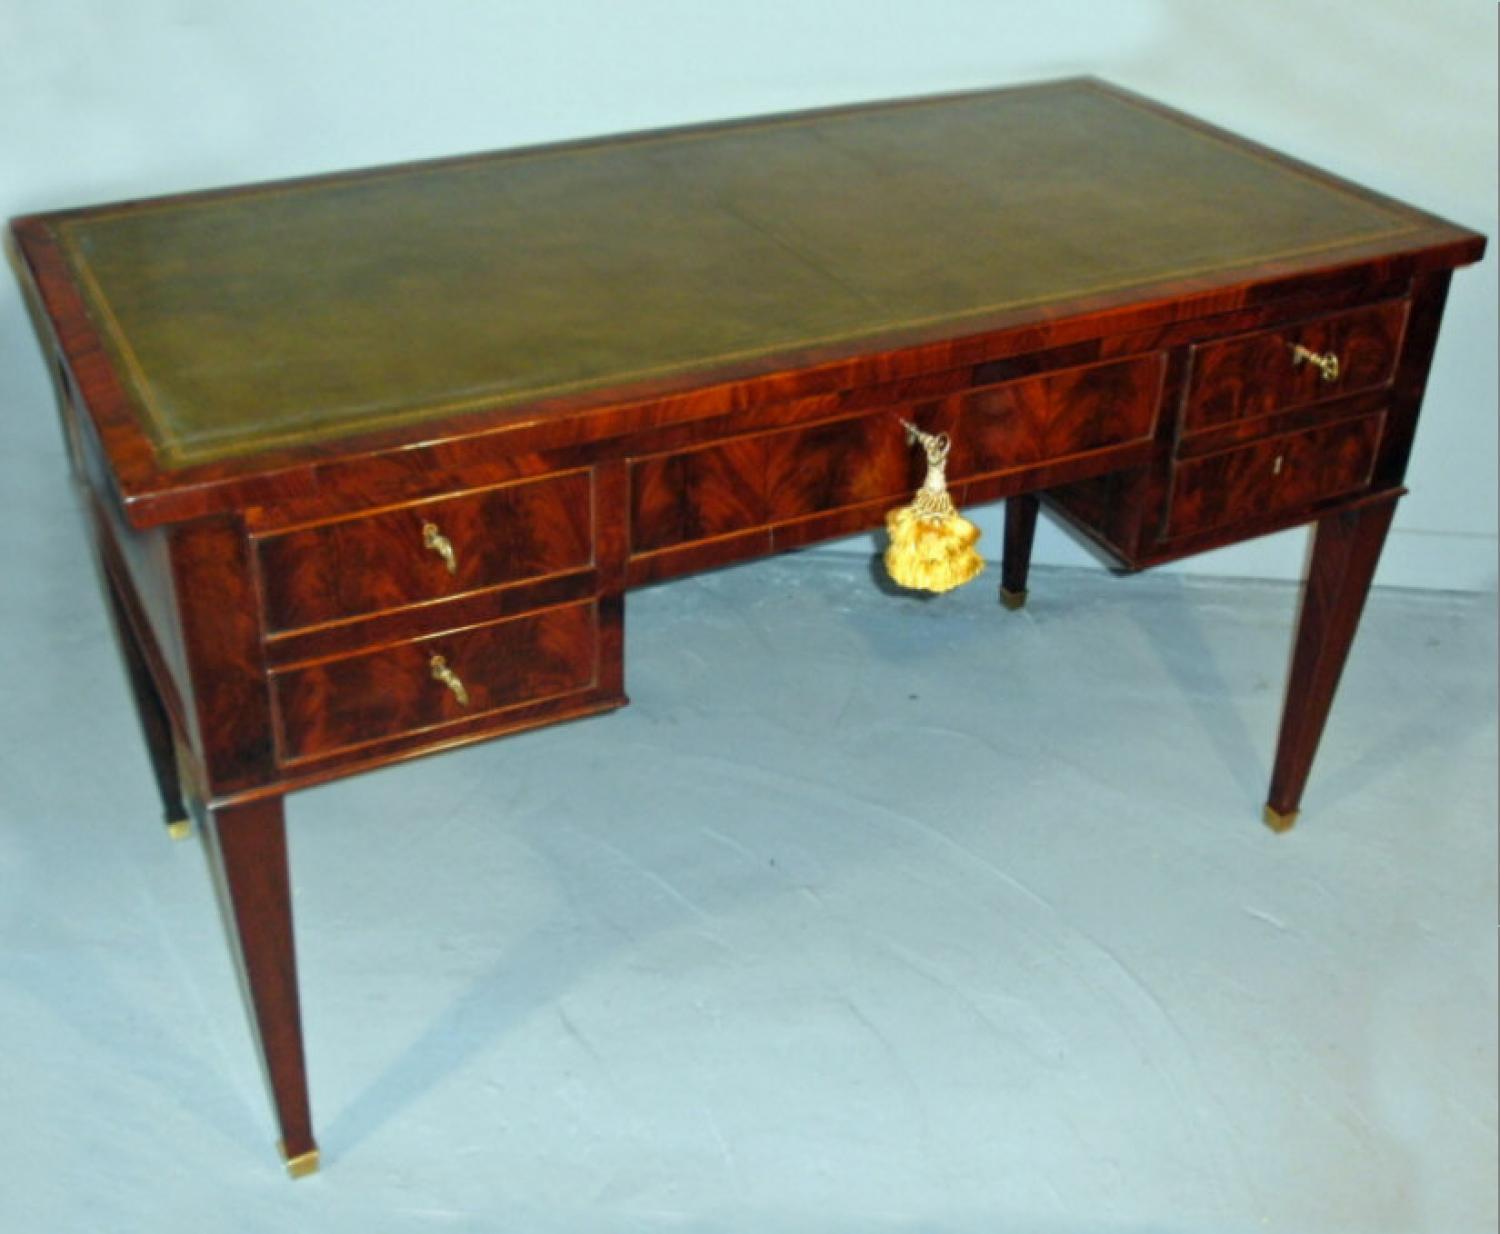 Louis XVI period flame mahogany bureau plat or writing desk c1790